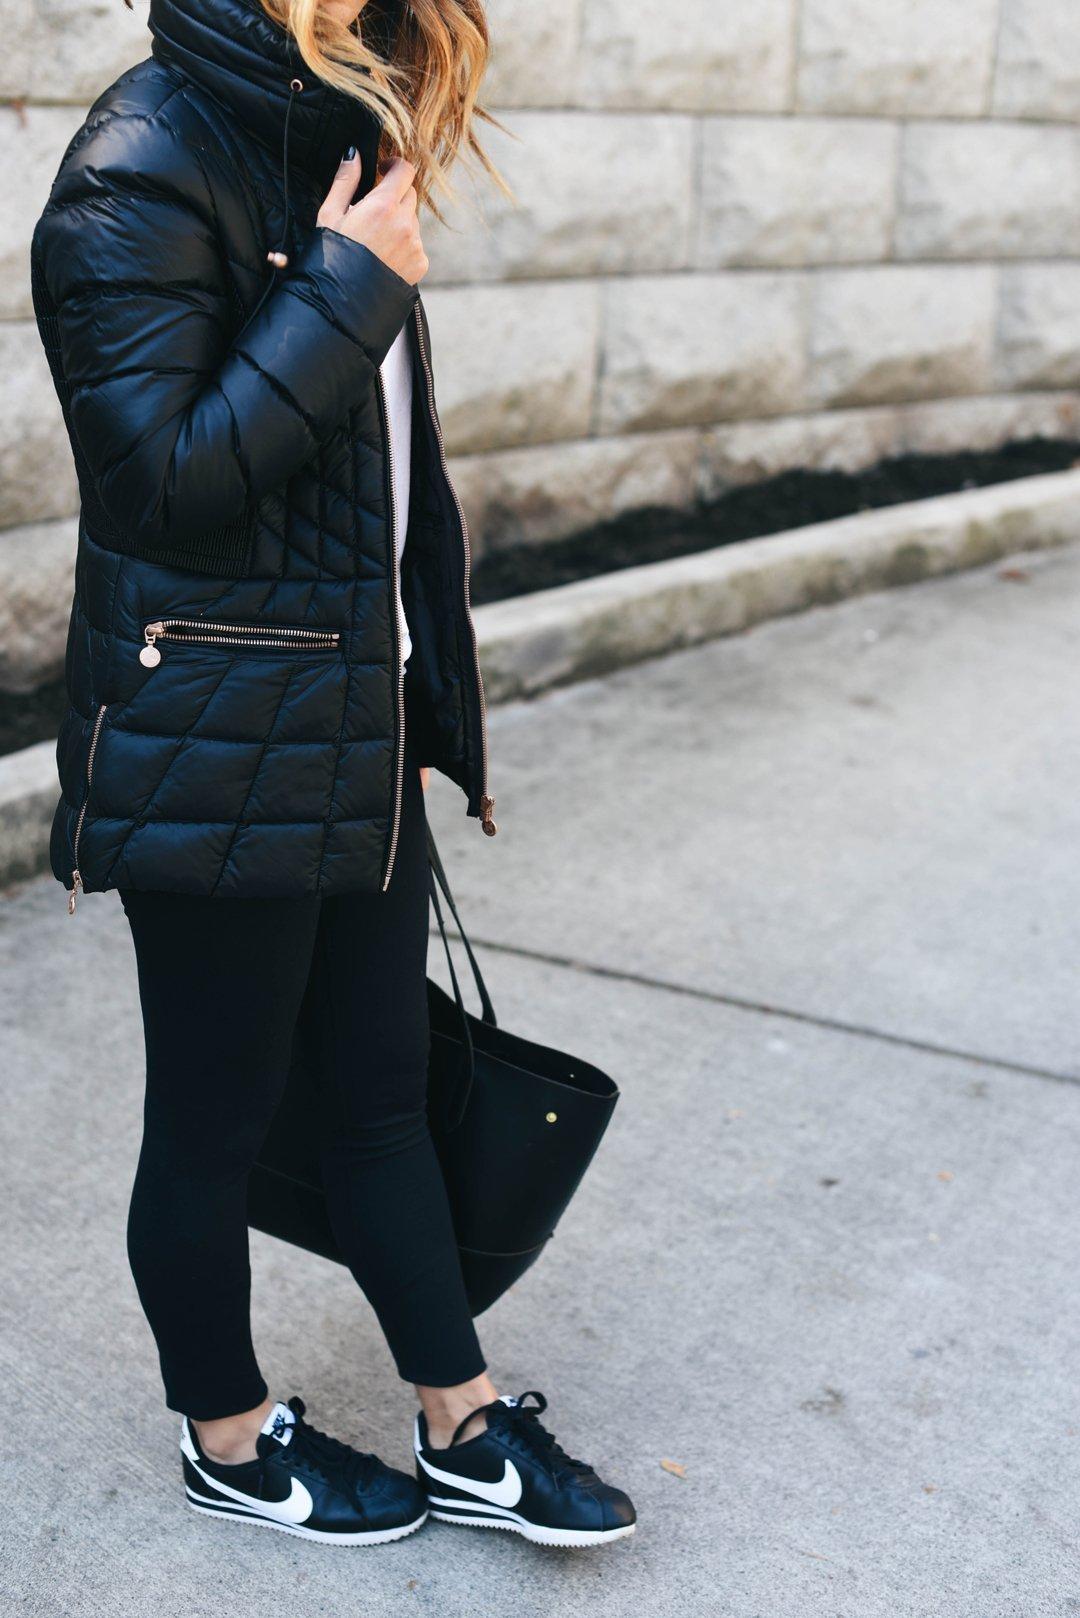 nike-black-cortez-sneakers